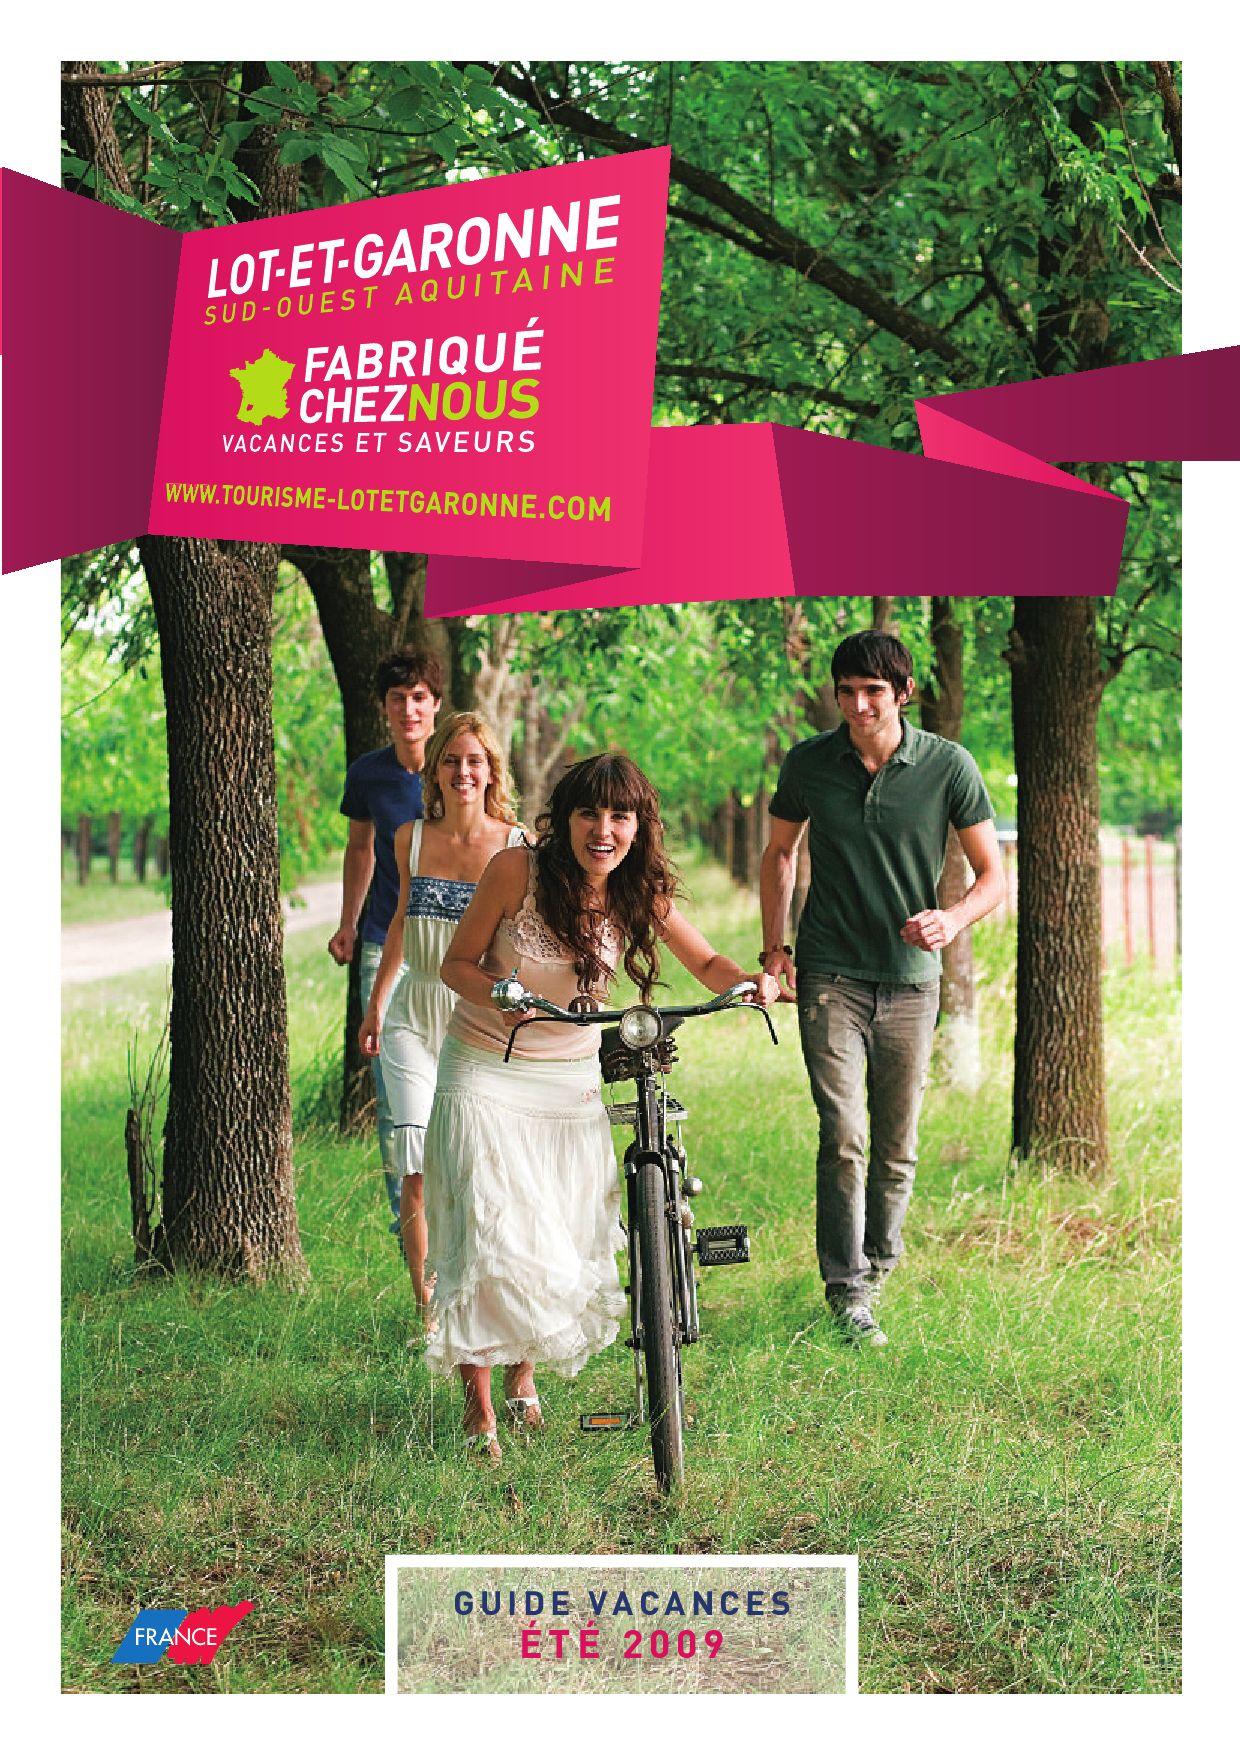 Lot Et Garonne Brochure By Frans Bureau Voor Toerisme Issuu